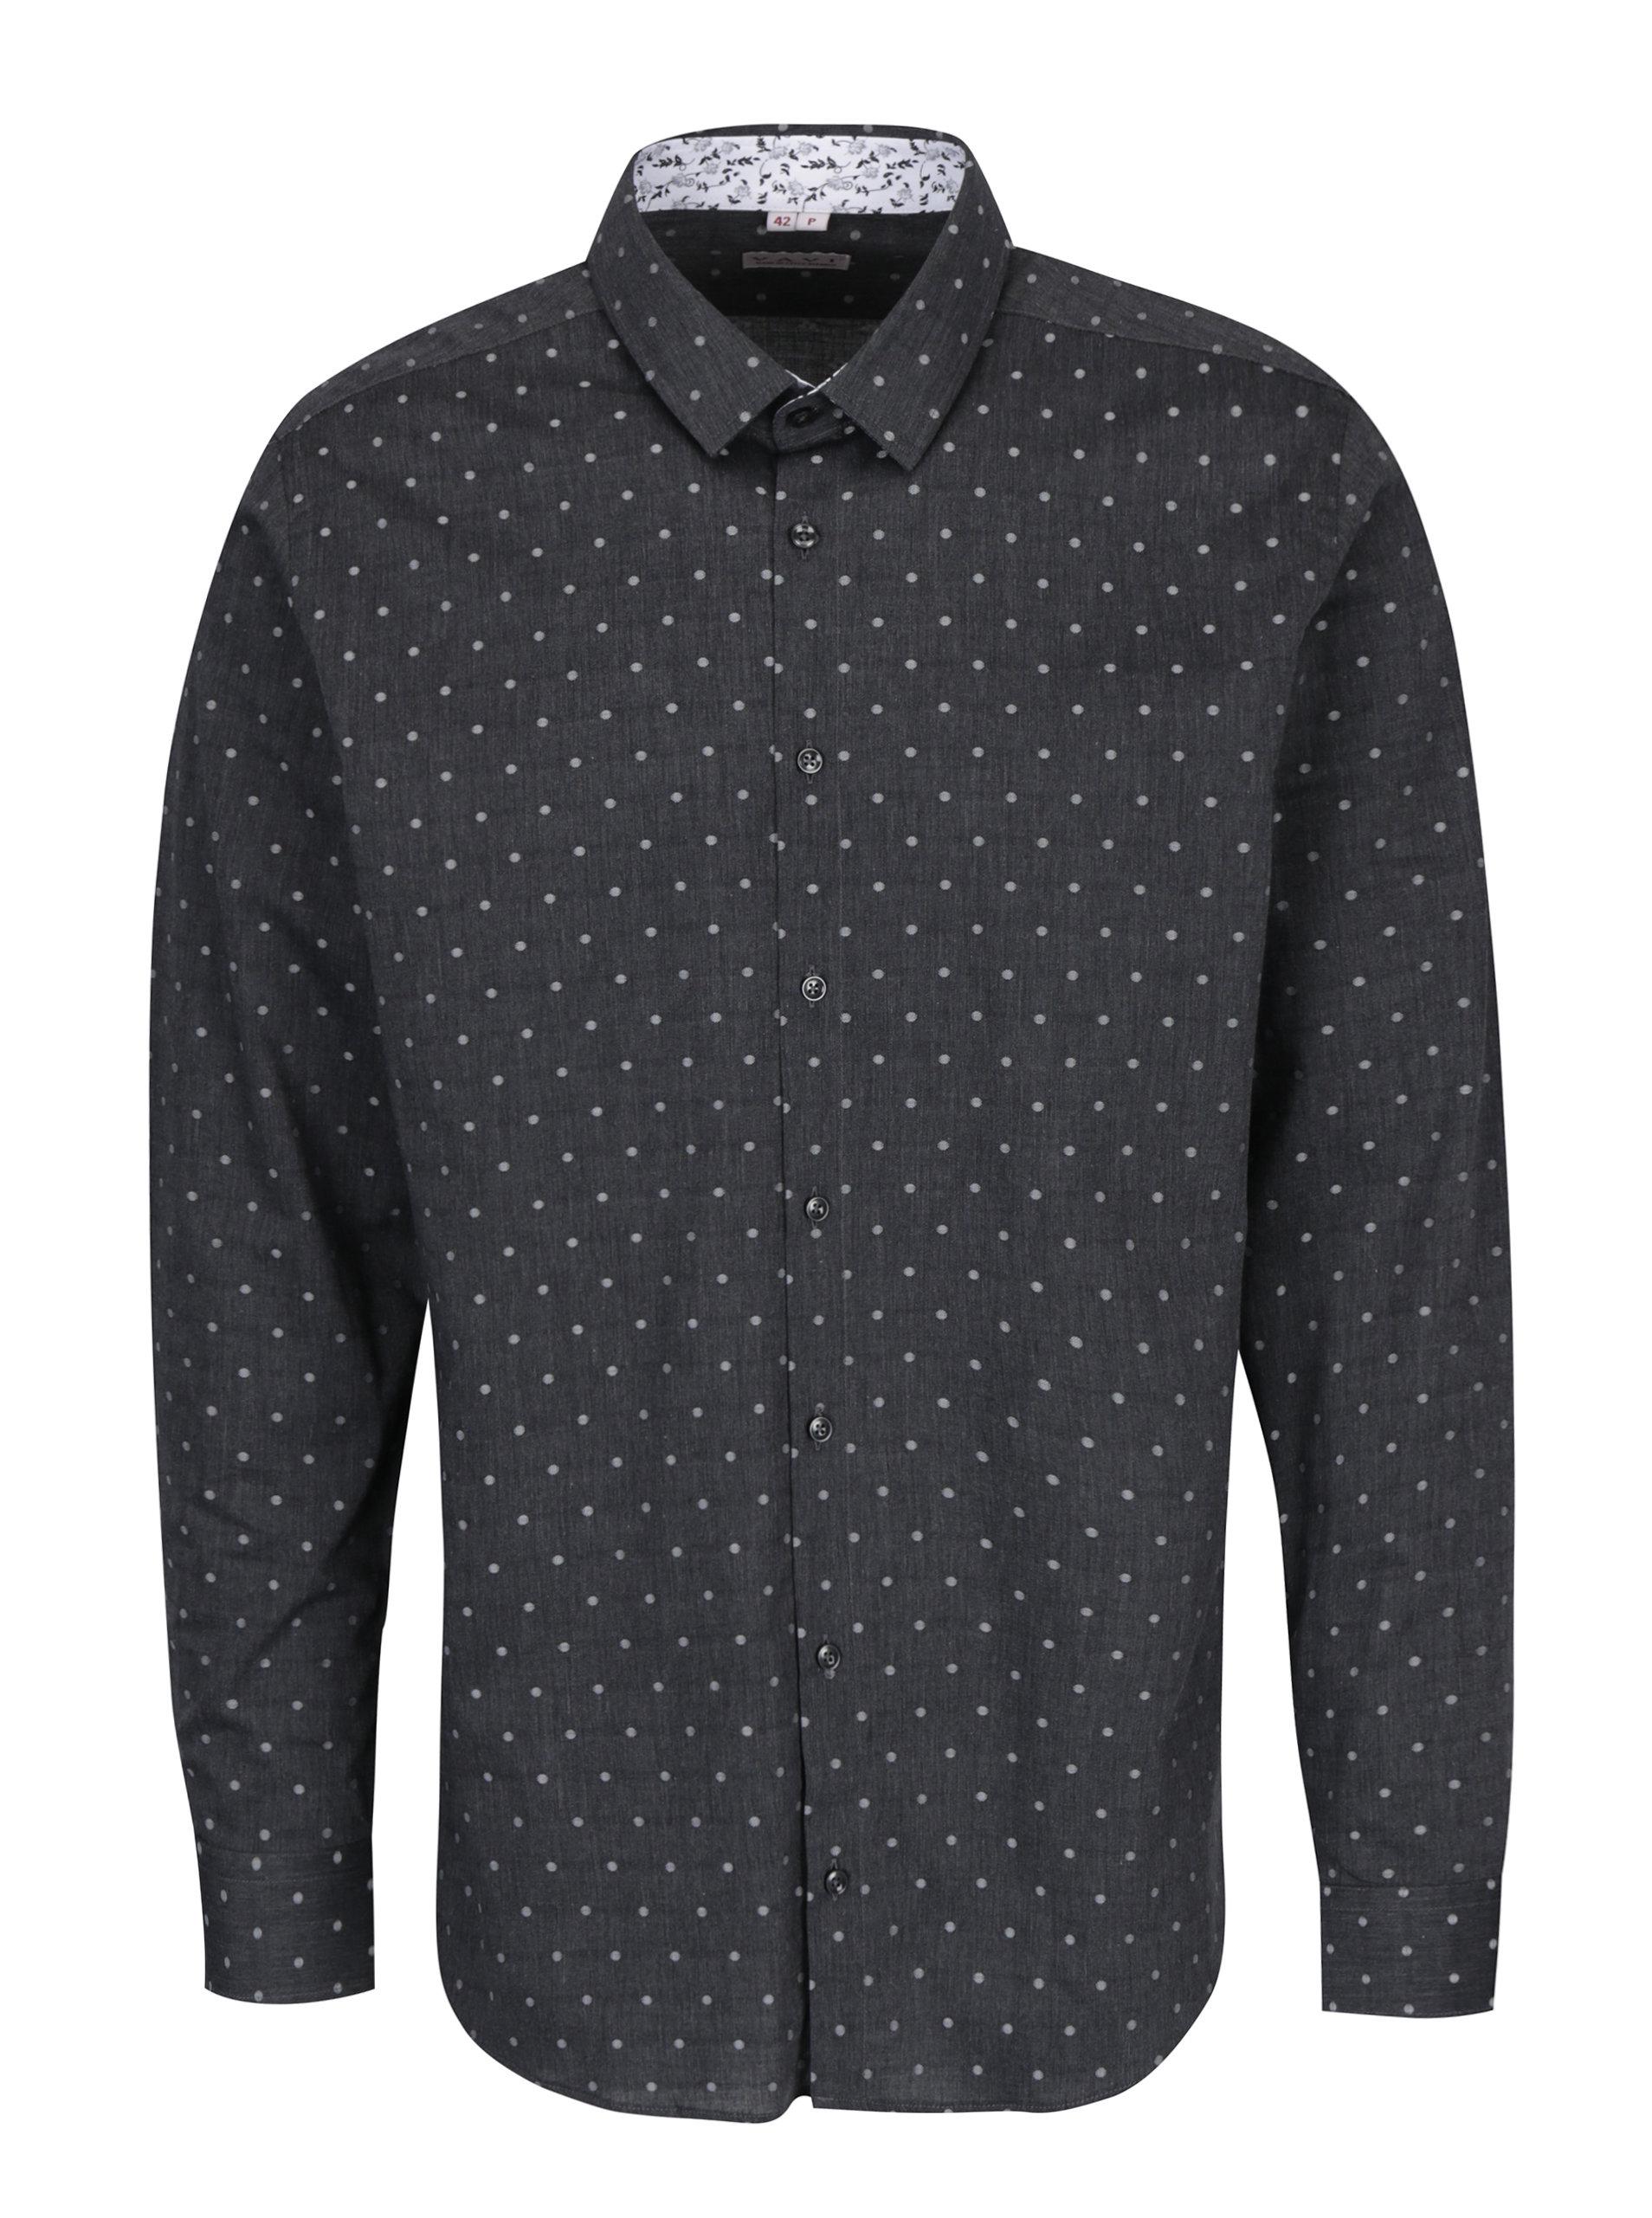 c47af033f392 Sivá pánska bodkovaná košeľa VAVI ...